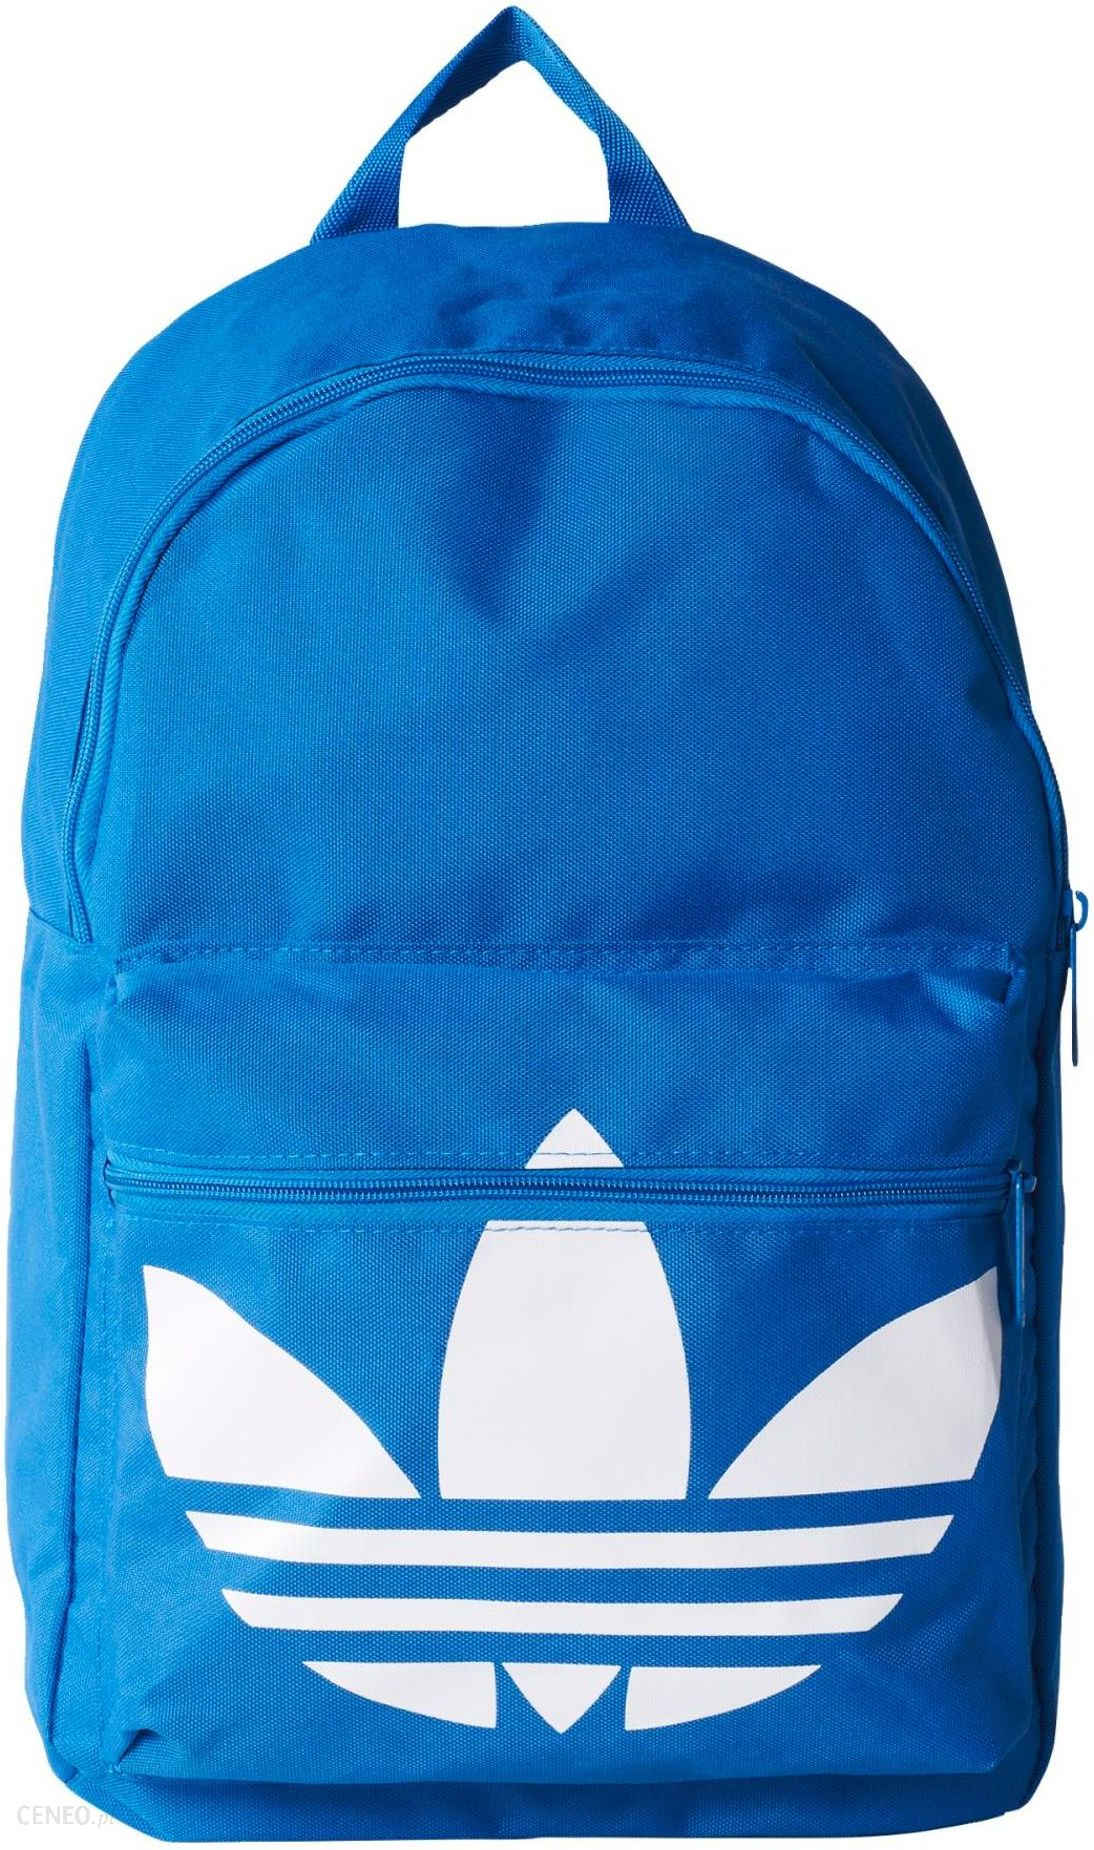 60c16c05a44c8 Plecak Adidas Originals Classic Trefoil Backpack Aj8528 - Ceny i ...